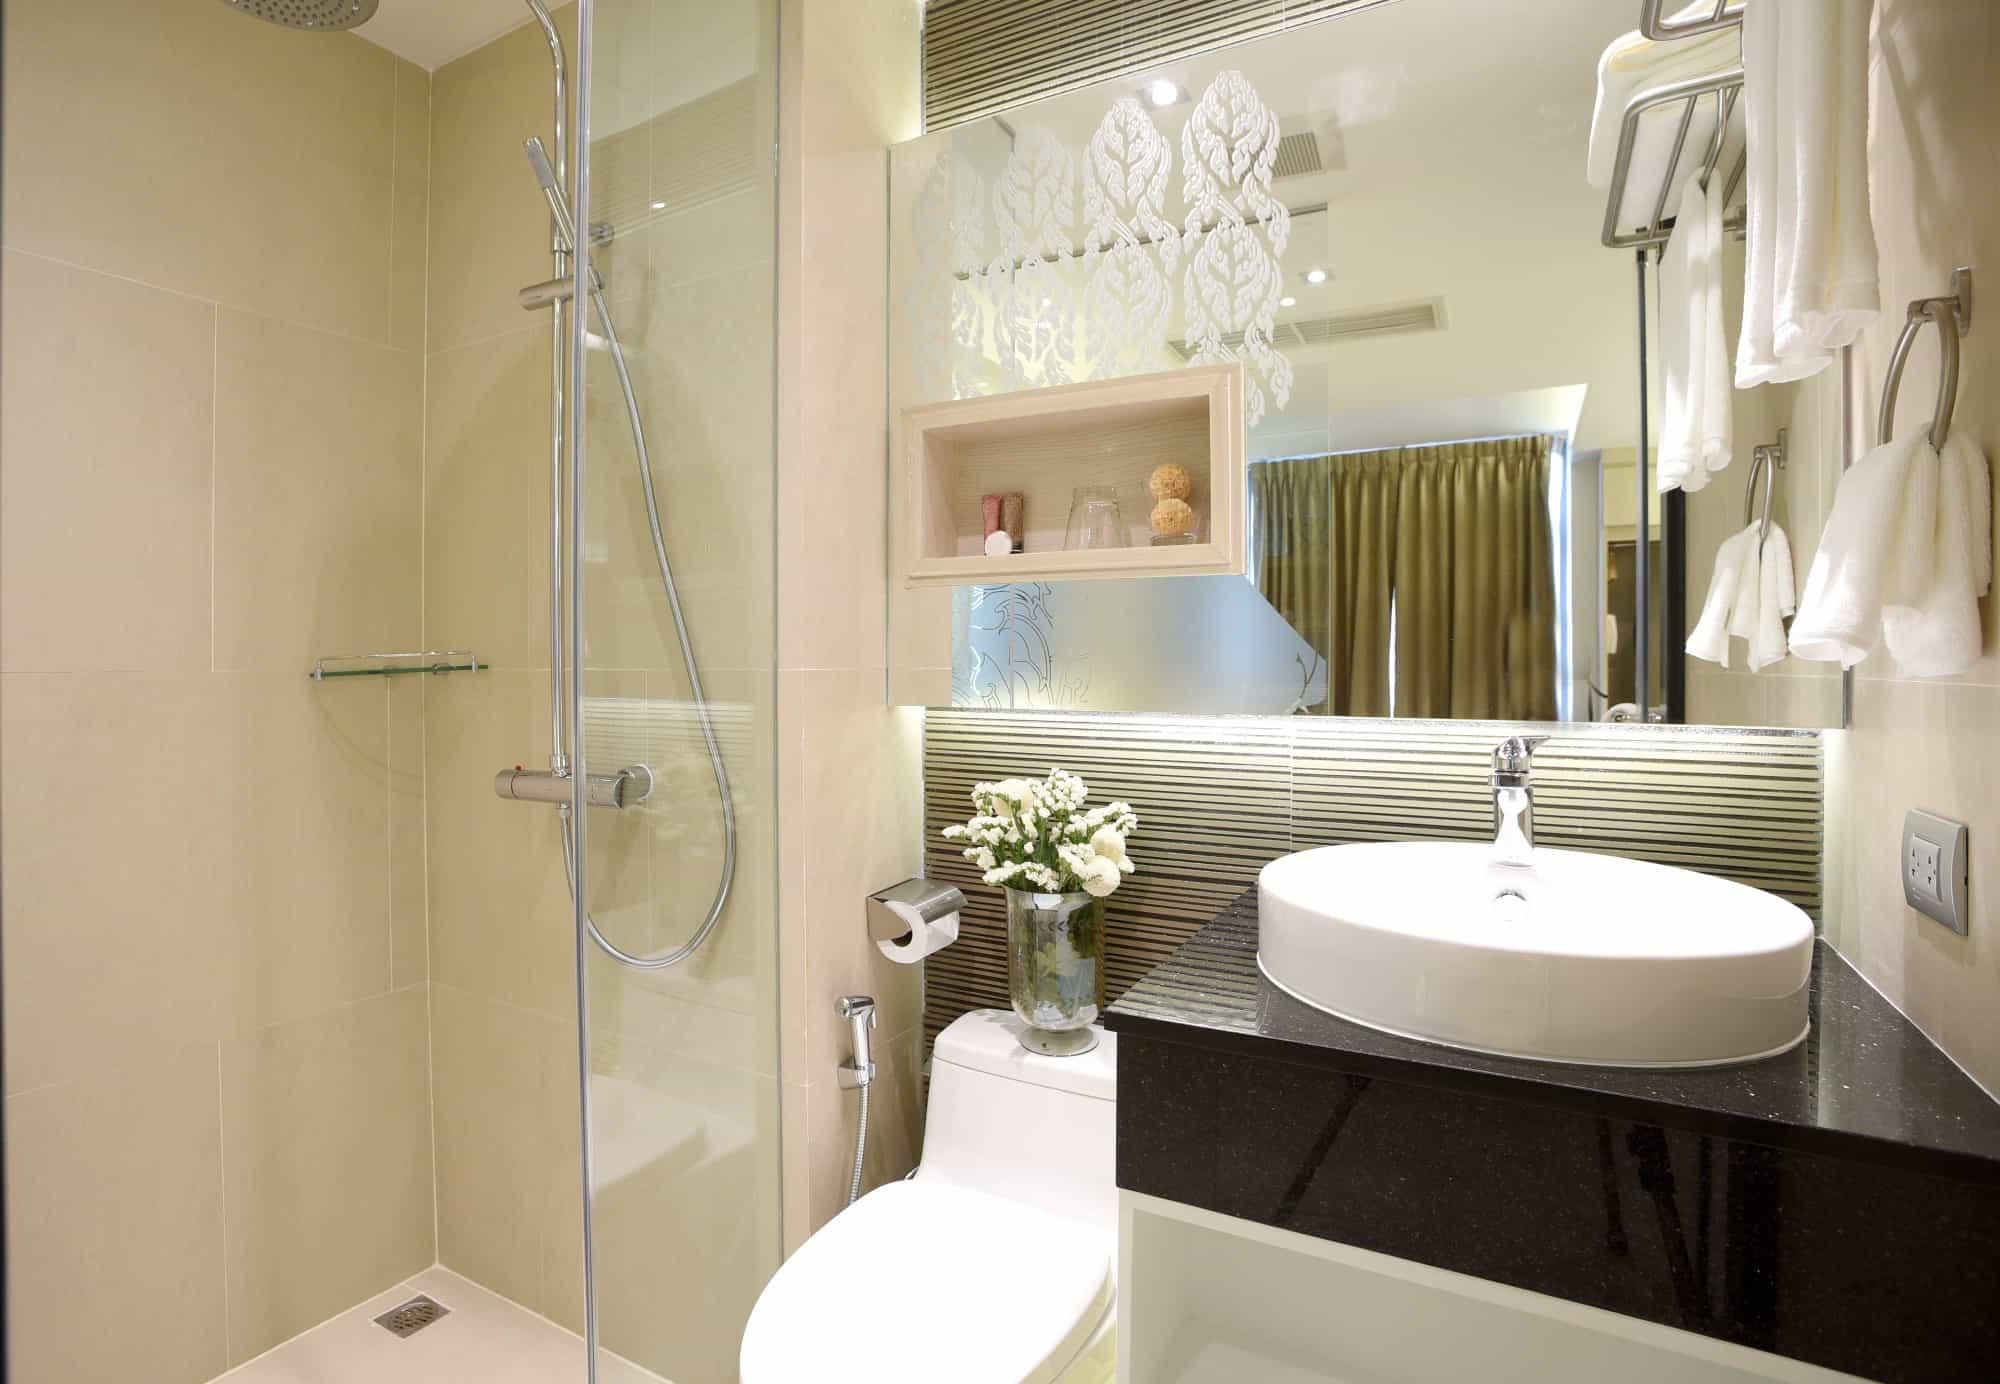 Bathroom Remodel Ideas 2020  5 Modern Small Bathroom Trends for 2020